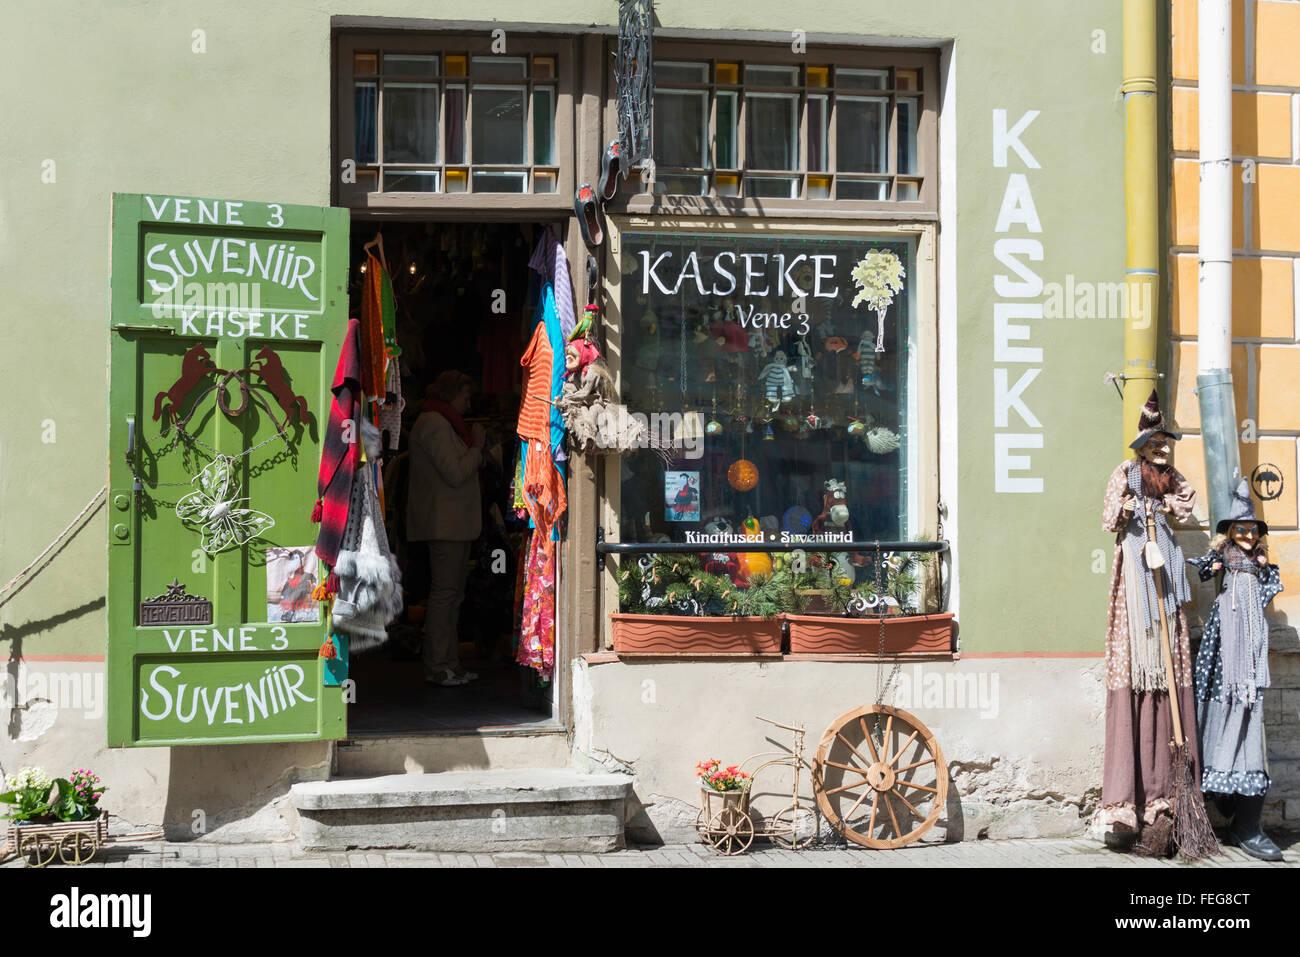 Kaseke Vene 3 Souvenir Shop, Vene, Old Town, Tallinn, Harju County, Republic of Estonia Stock Photo